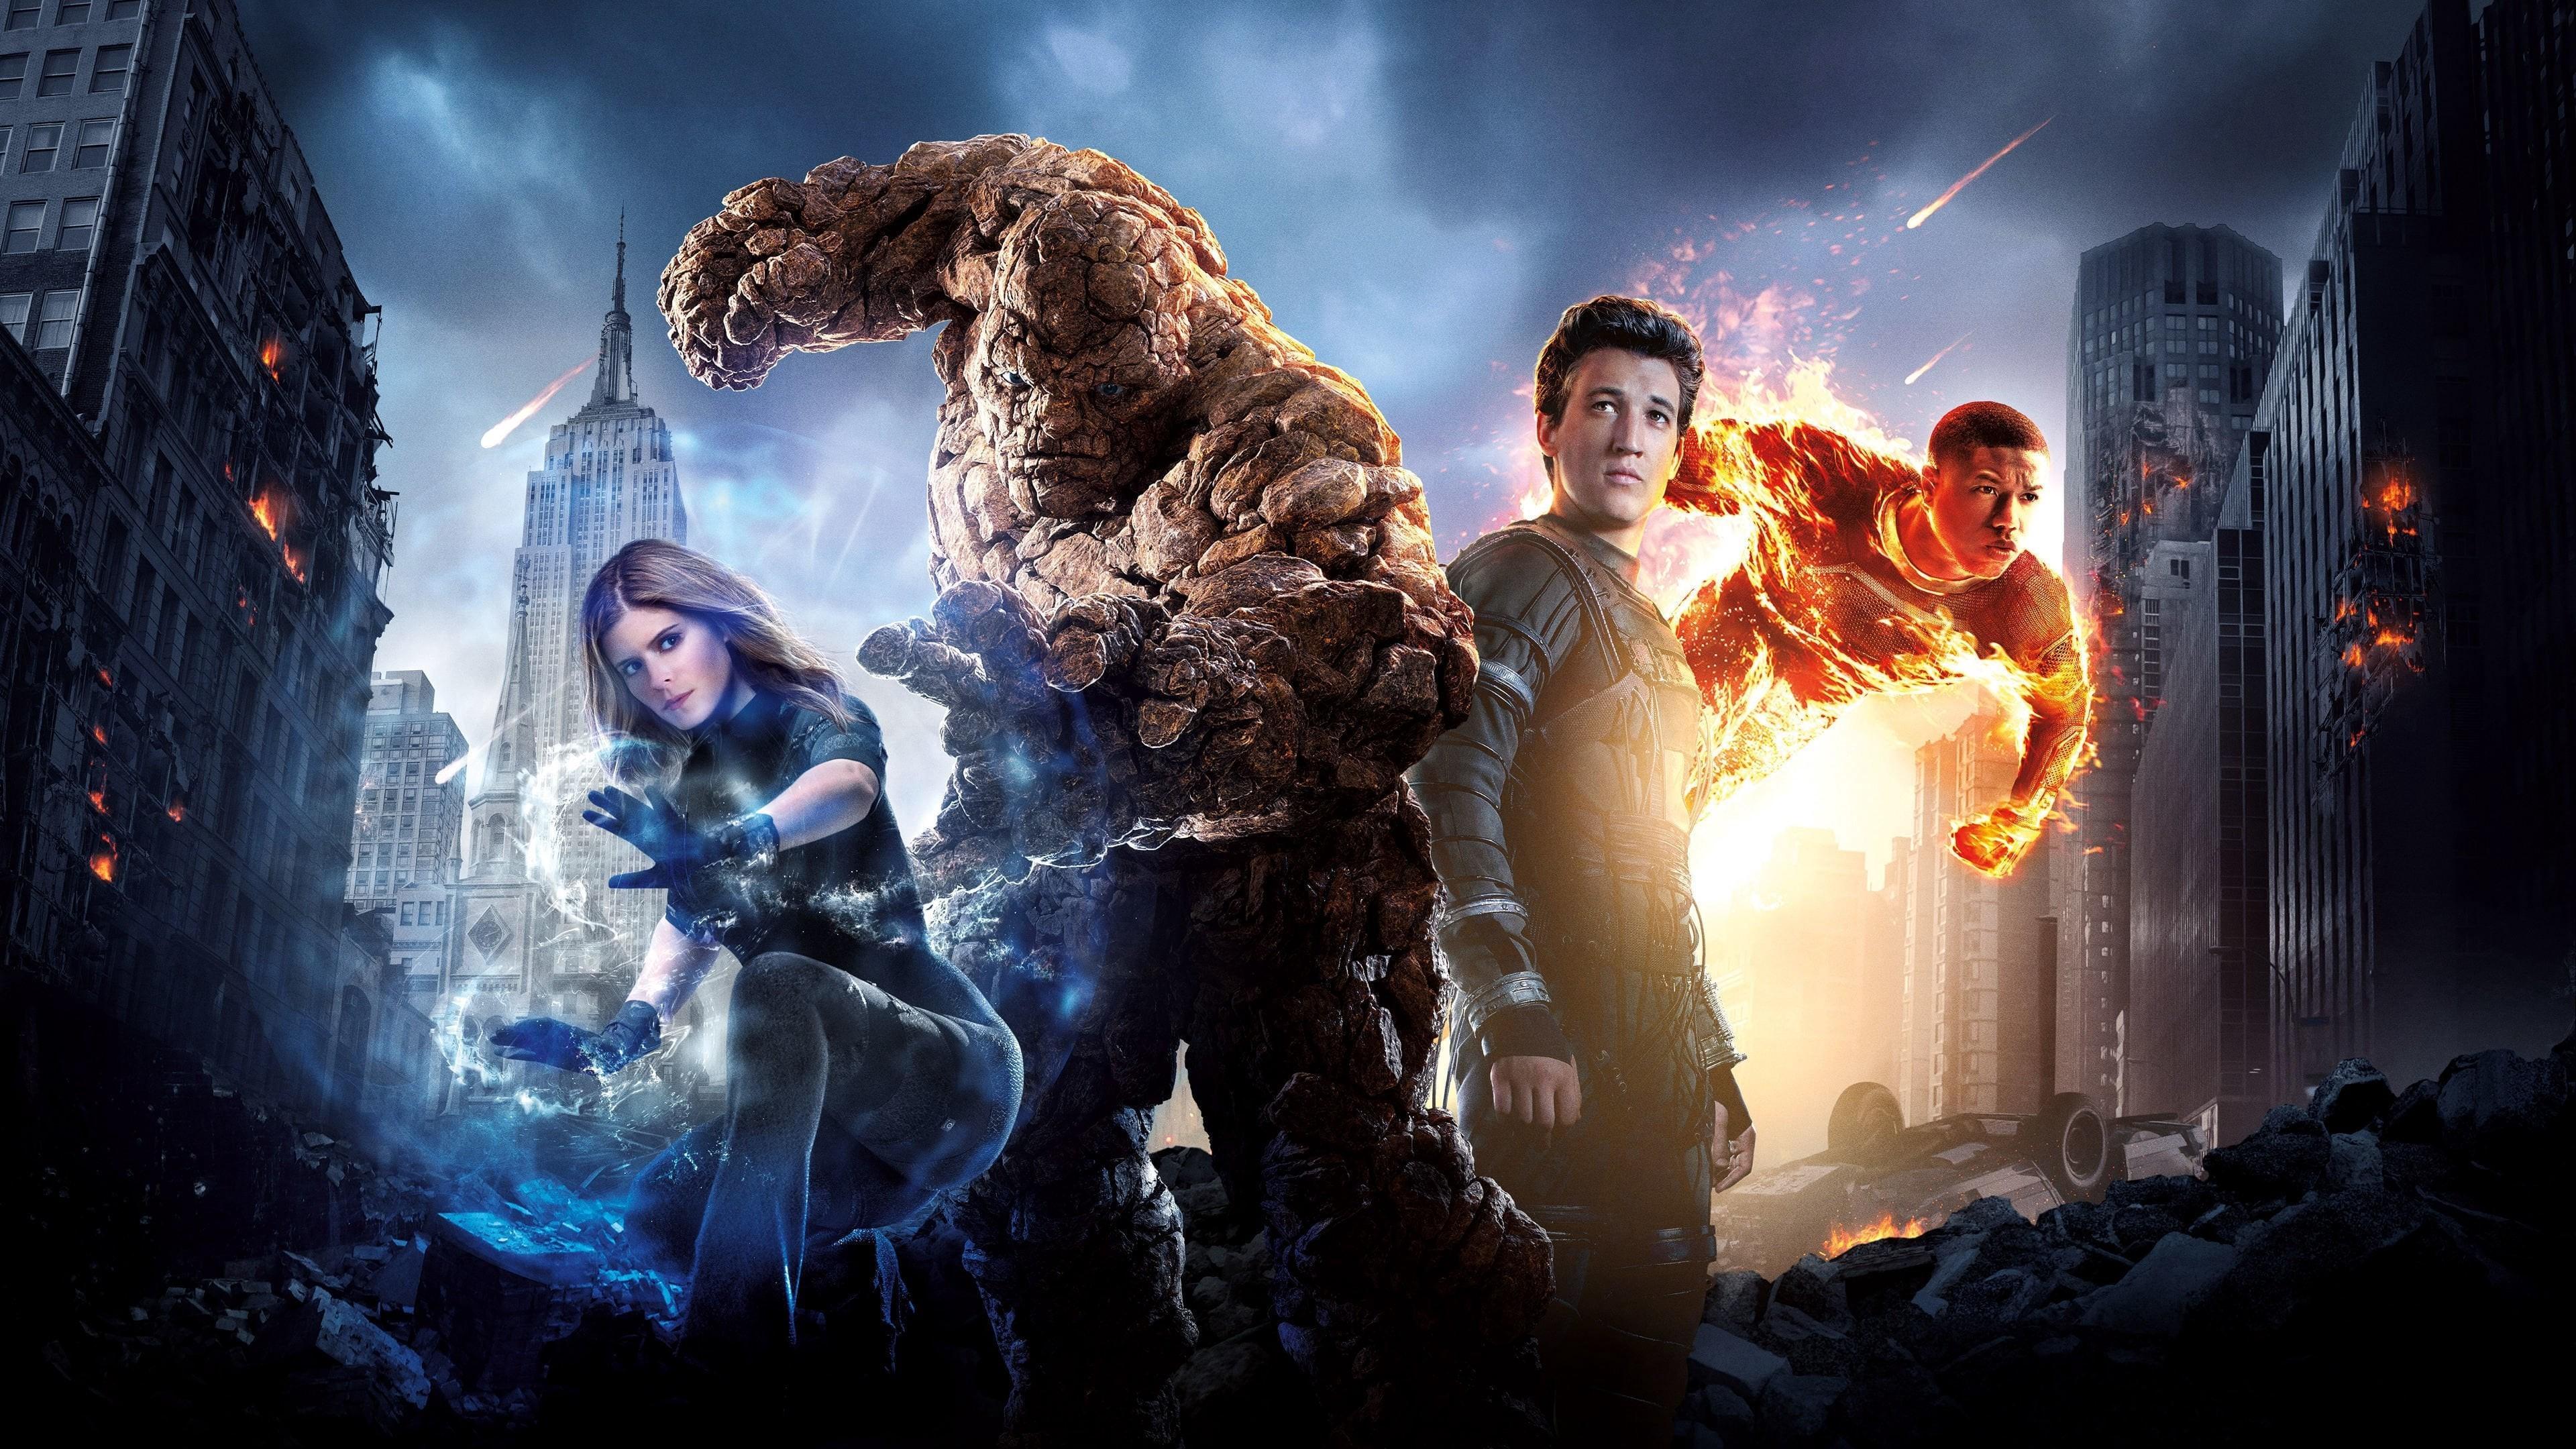 fantastic four poster 4k 1602434845 - Fantastic Four Poster 4k - Fantastic Four Poster 4k wallpapers